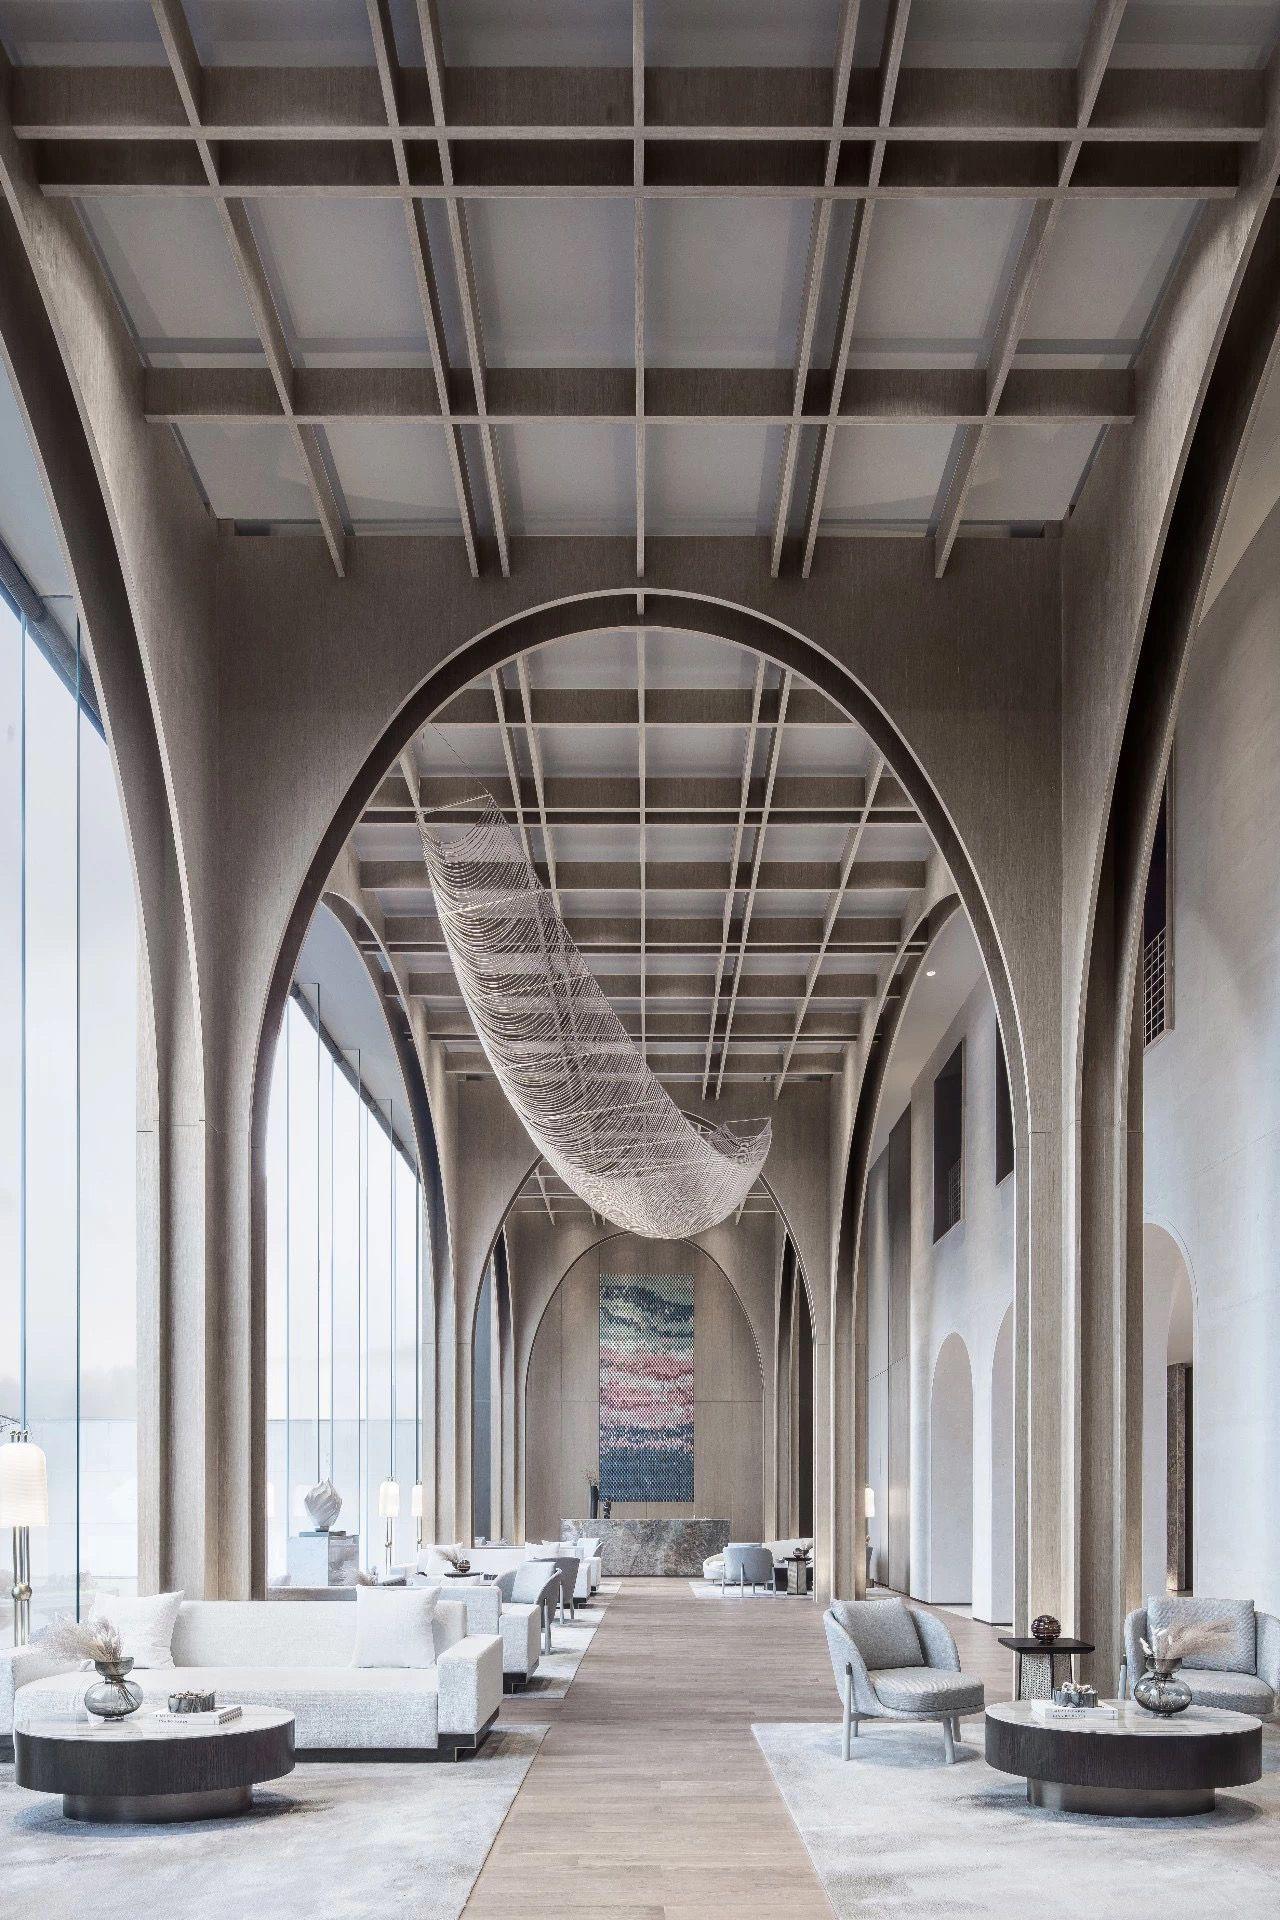 Commerciallobby In 2020 Hotel Lobby Design Hotel Interior Design Hotel Architecture